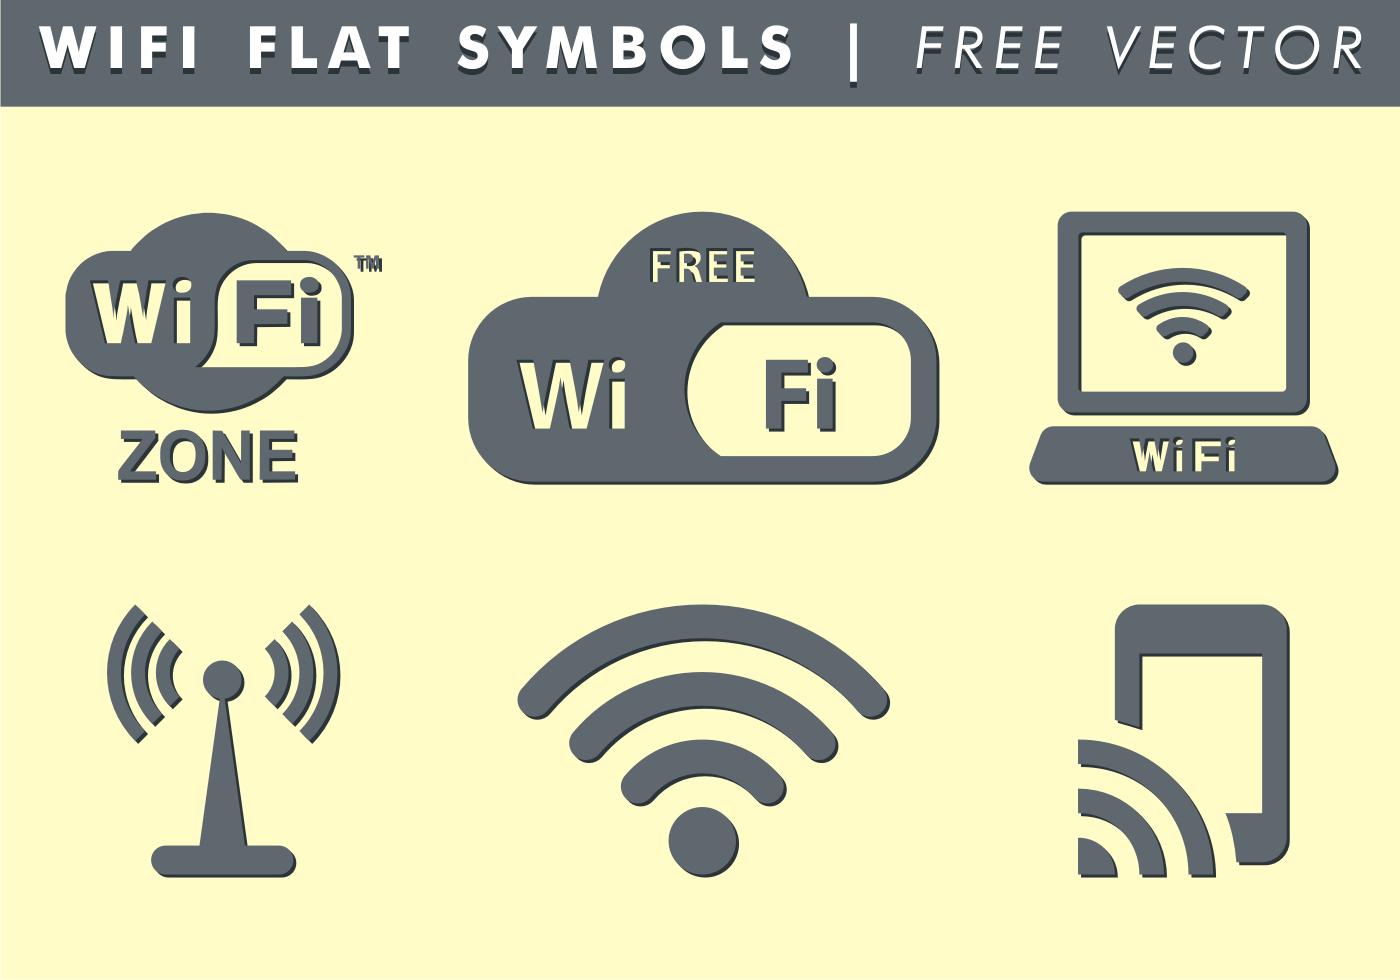 Wifi Symbols Free Vector Download Free Vector Art Stock